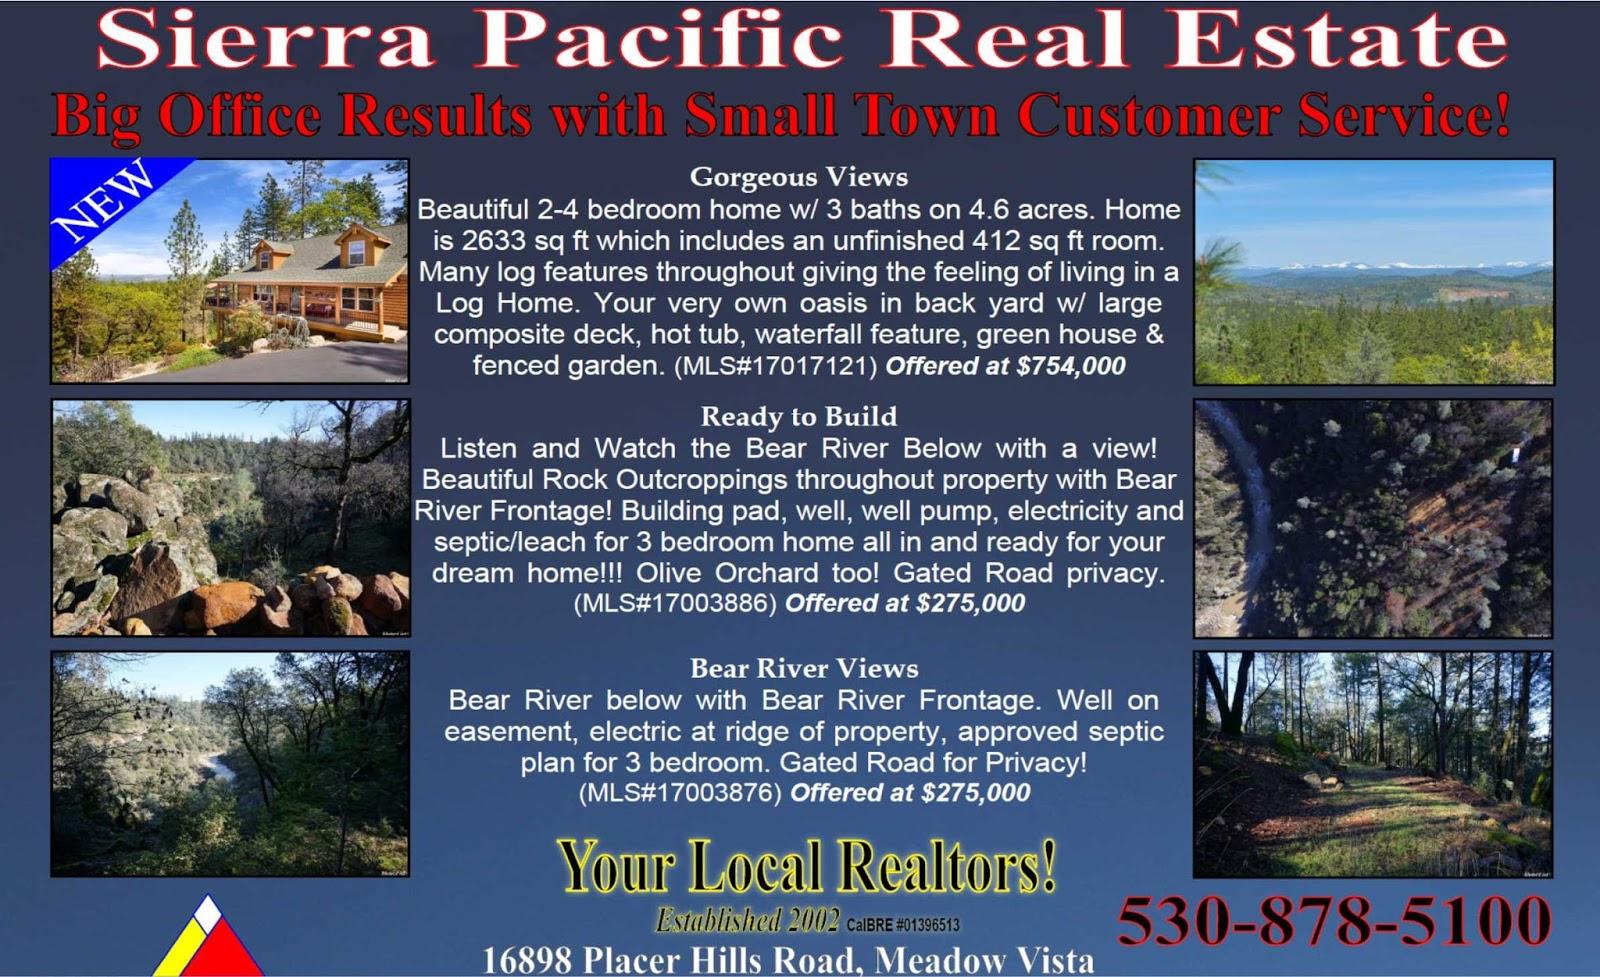 Meadow Vista View Magazine: Meadow Vista Friendly Neighbors News